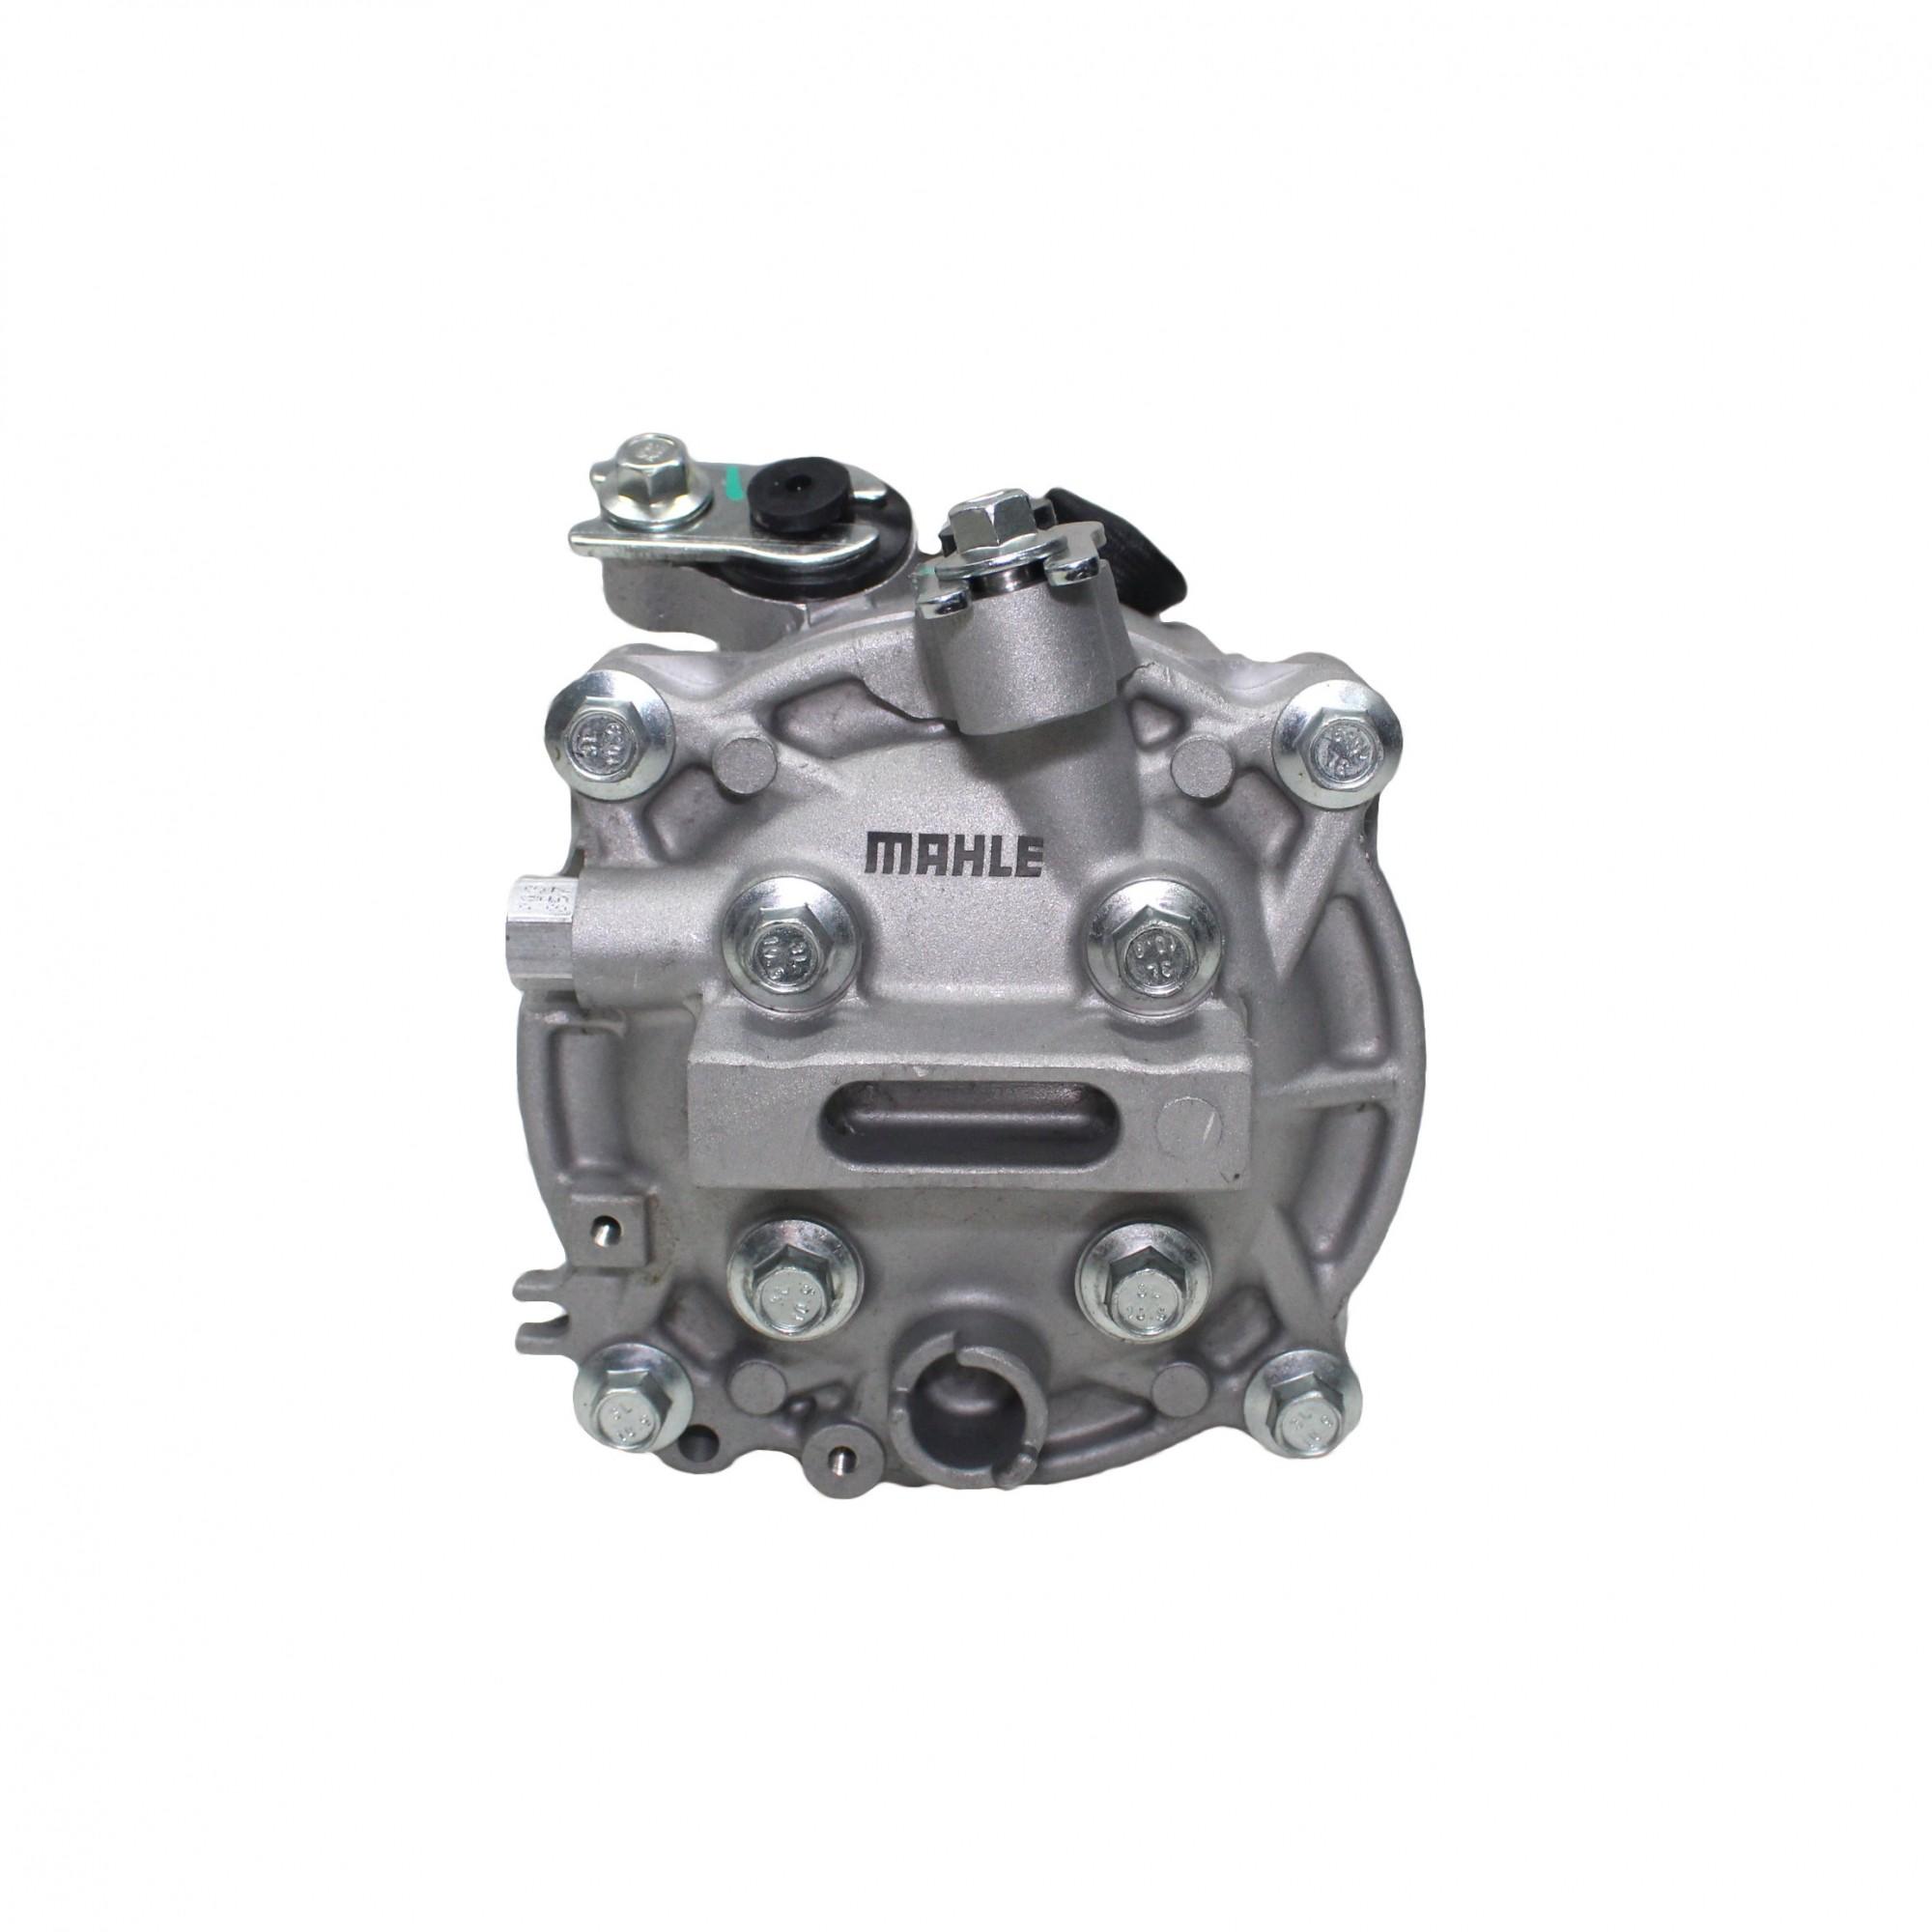 Compressor Ar Condicionado Mahle Onix, Prisma, Spin, Sonic, Cobalt